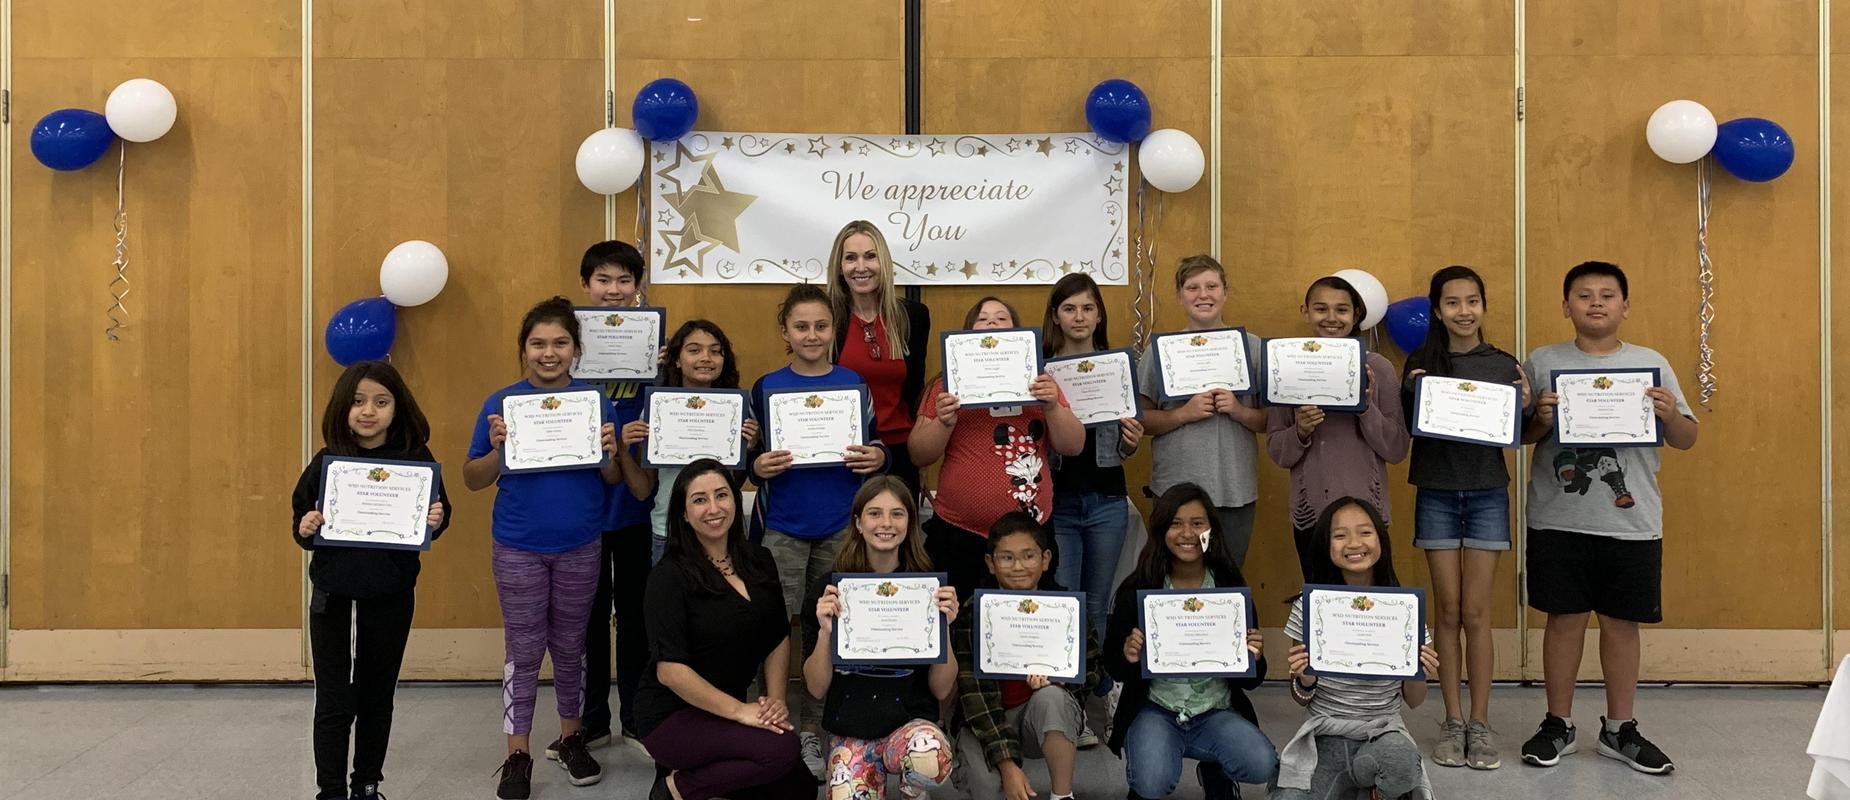 Nutrition Services Student Volunteer Awards